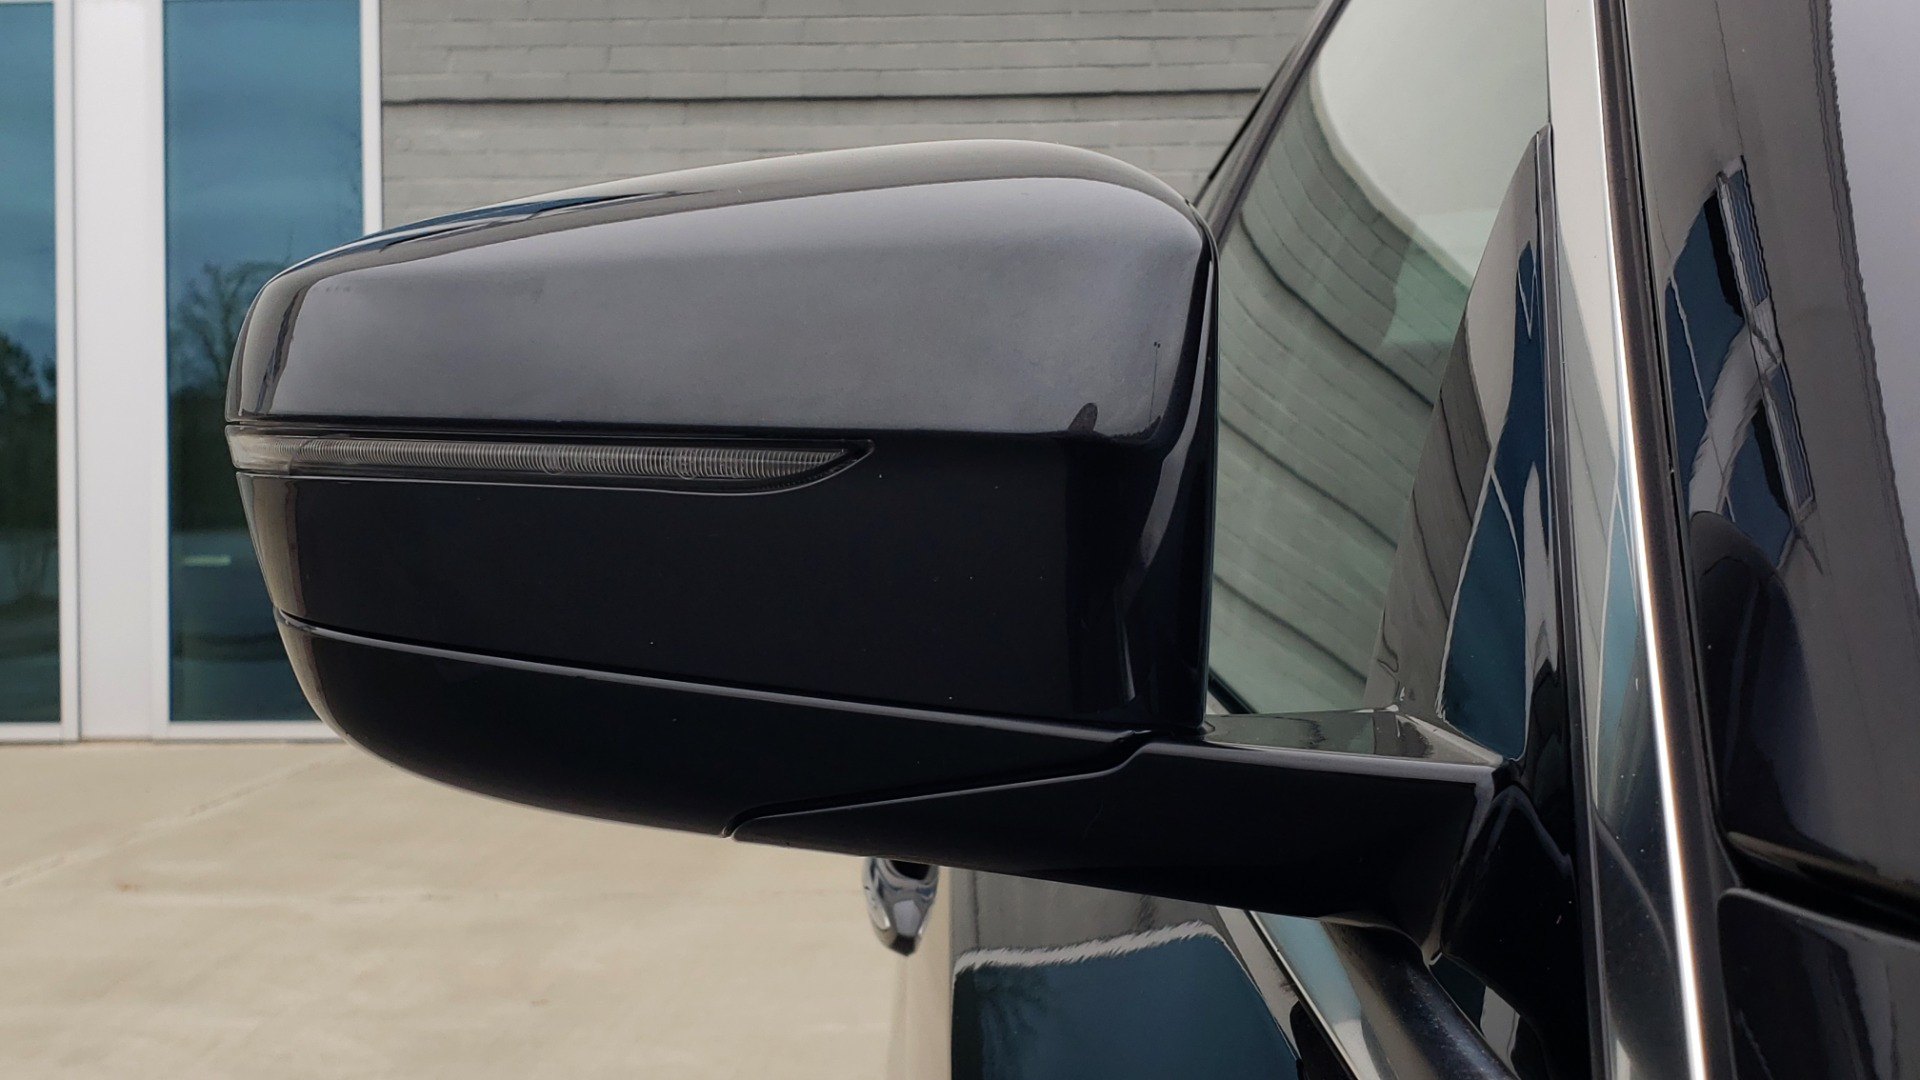 Used 2017 BMW 5 SERIES 530IXDRIVE / PREM PKG / DRVR ASST PLUS / CLD WTHR / APPLE CARPLAY for sale Sold at Formula Imports in Charlotte NC 28227 23